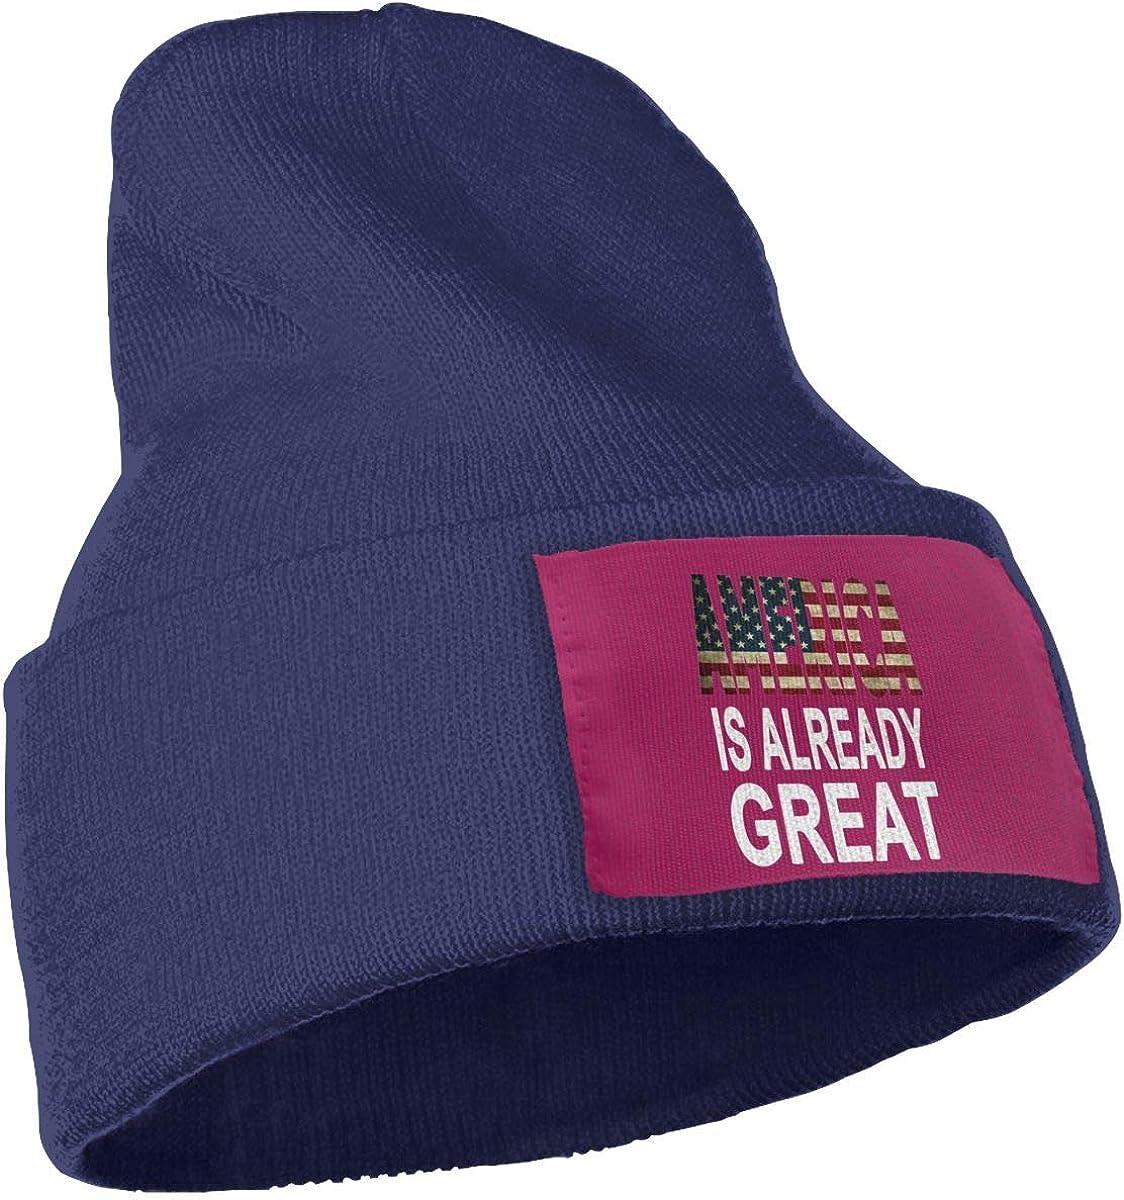 Poii Qon America is Already Great Beanie Hats Wool Skull Cap for Women Men